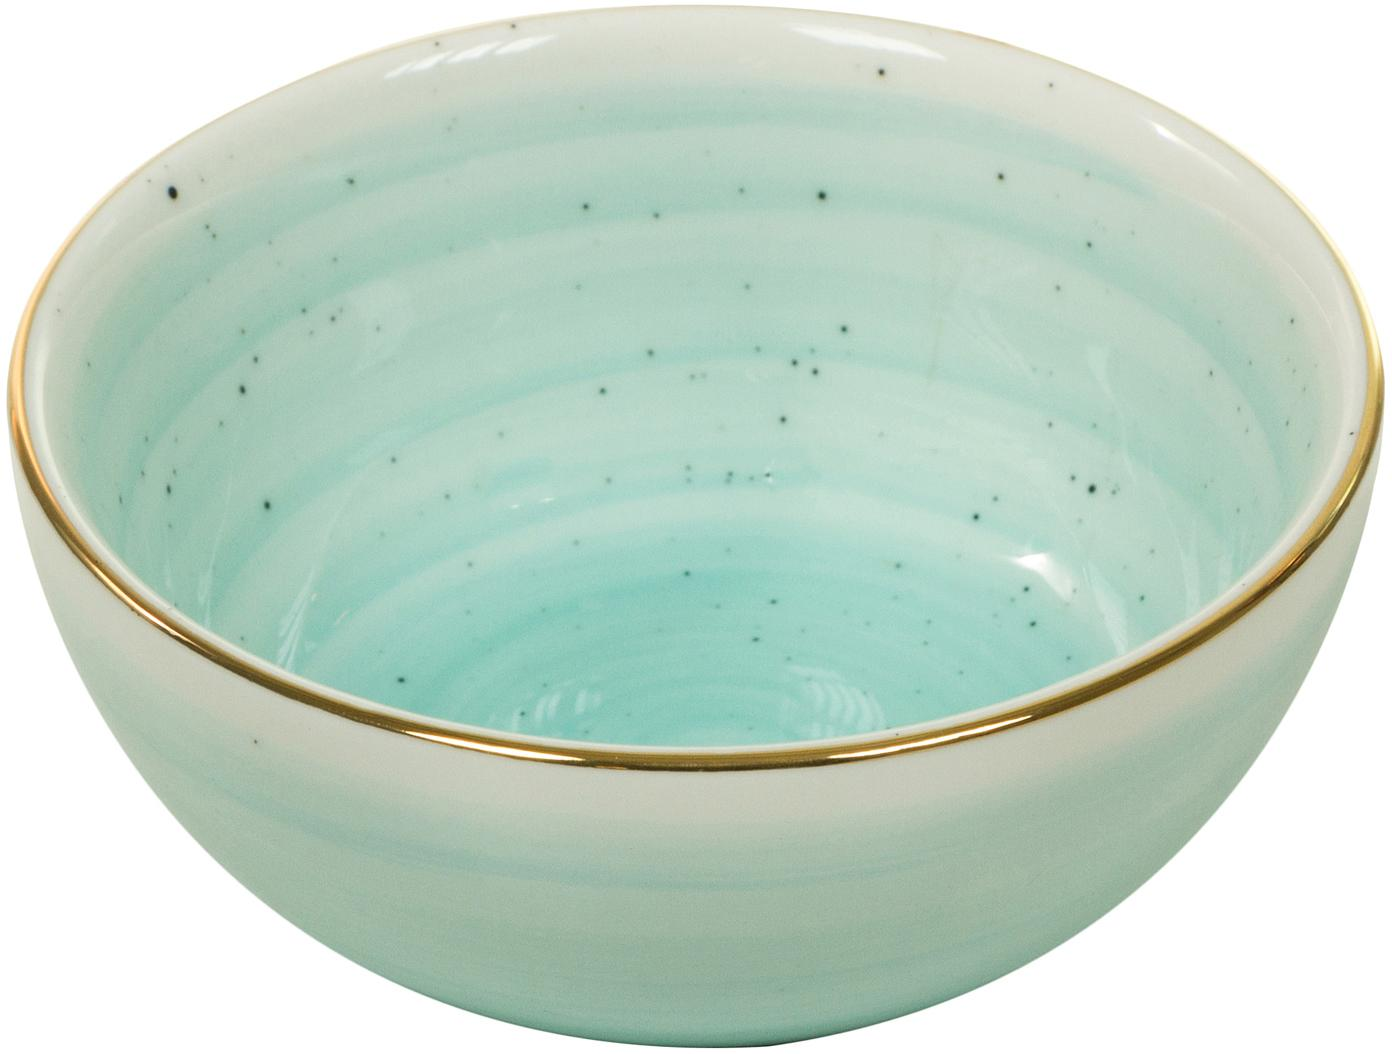 Cuencos artesanales Bol, 2uds., Porcelana, Azul turquesa, Ø 10 x Al 6 cm